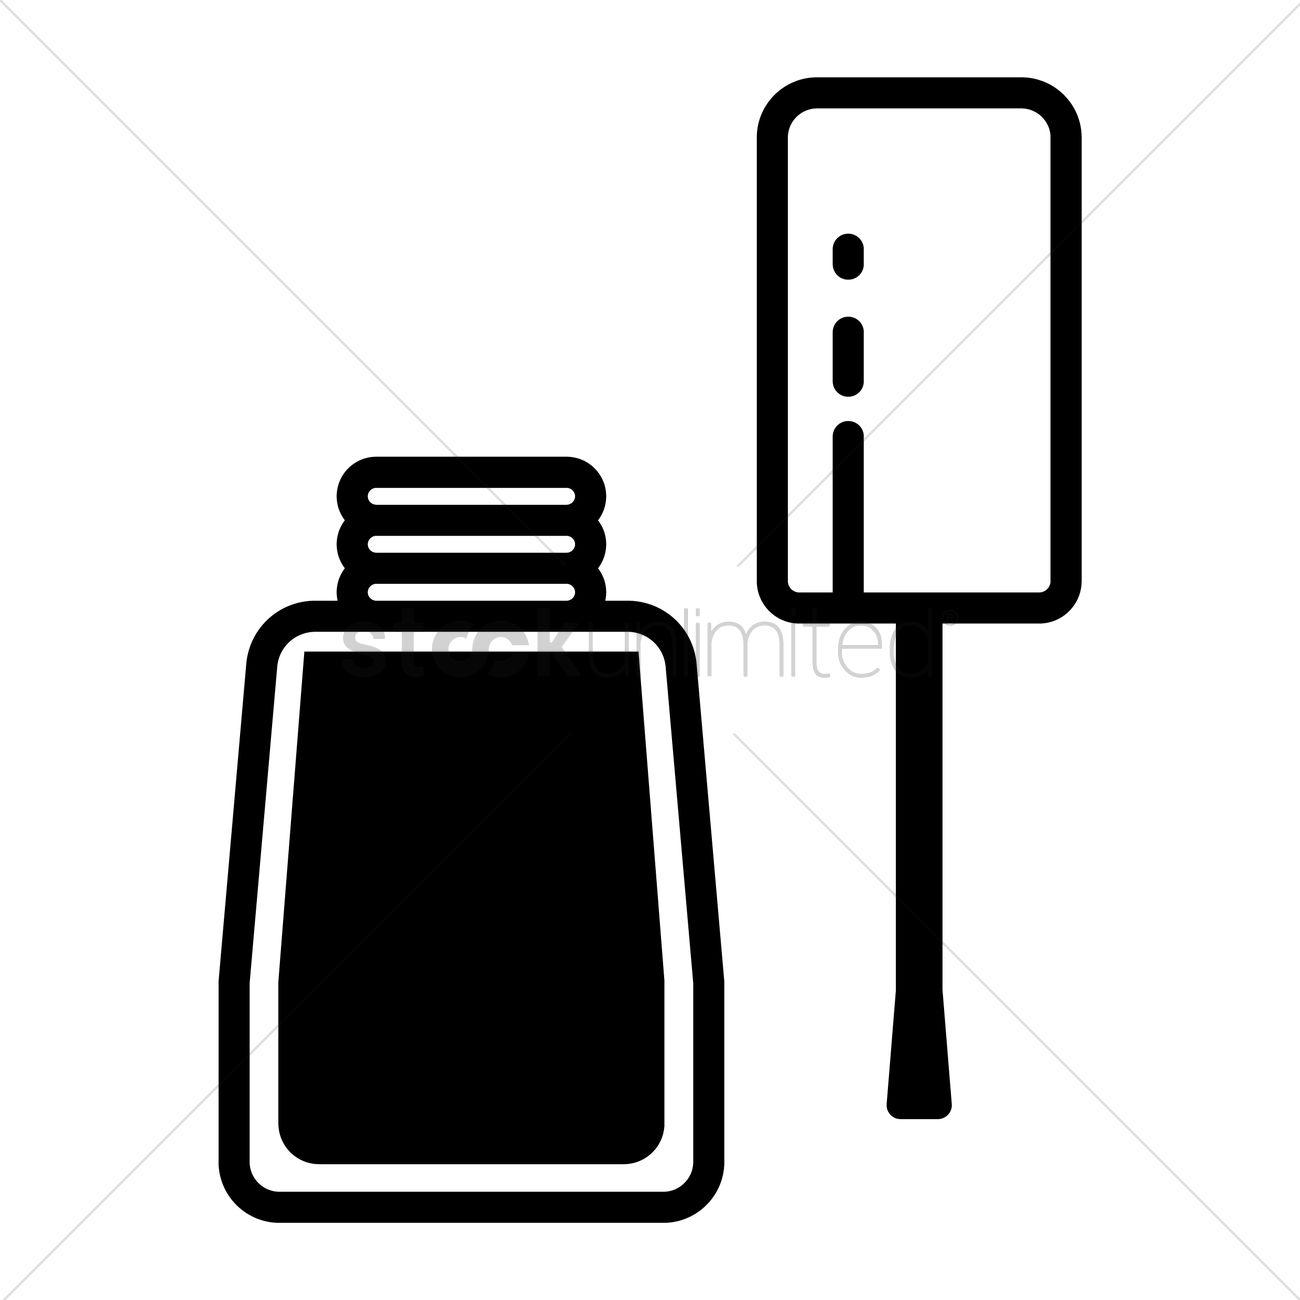 nail salon clipart black and white wwwimgkidcom the